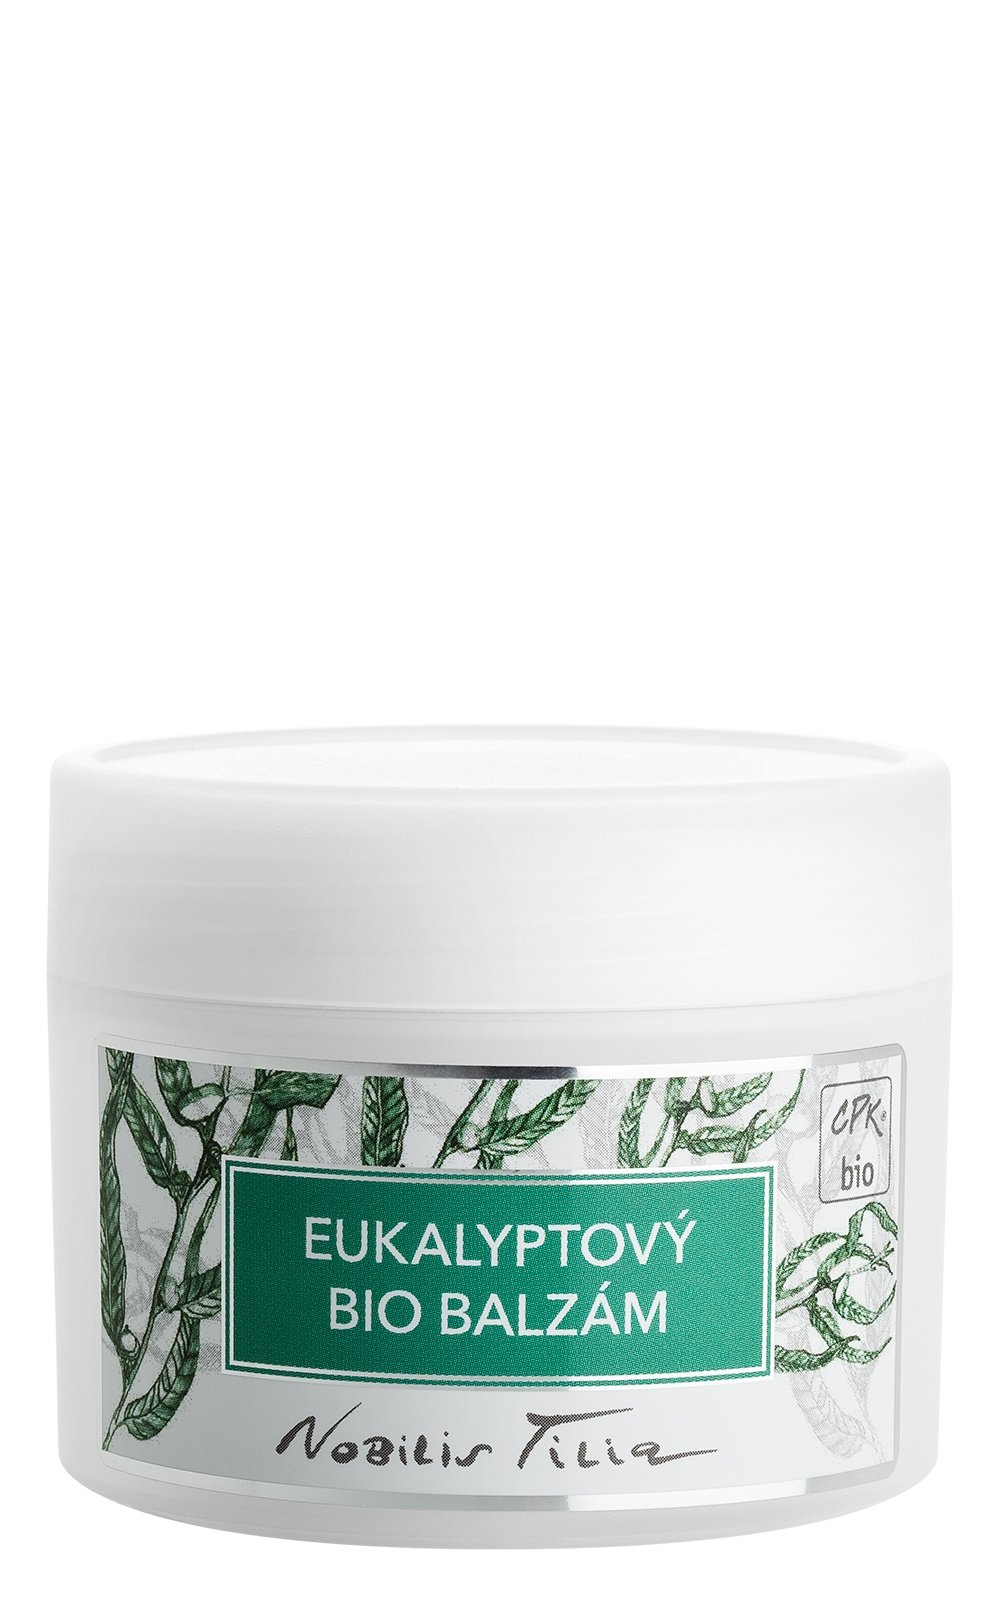 Eukalyptový bio balzám: 50 ml